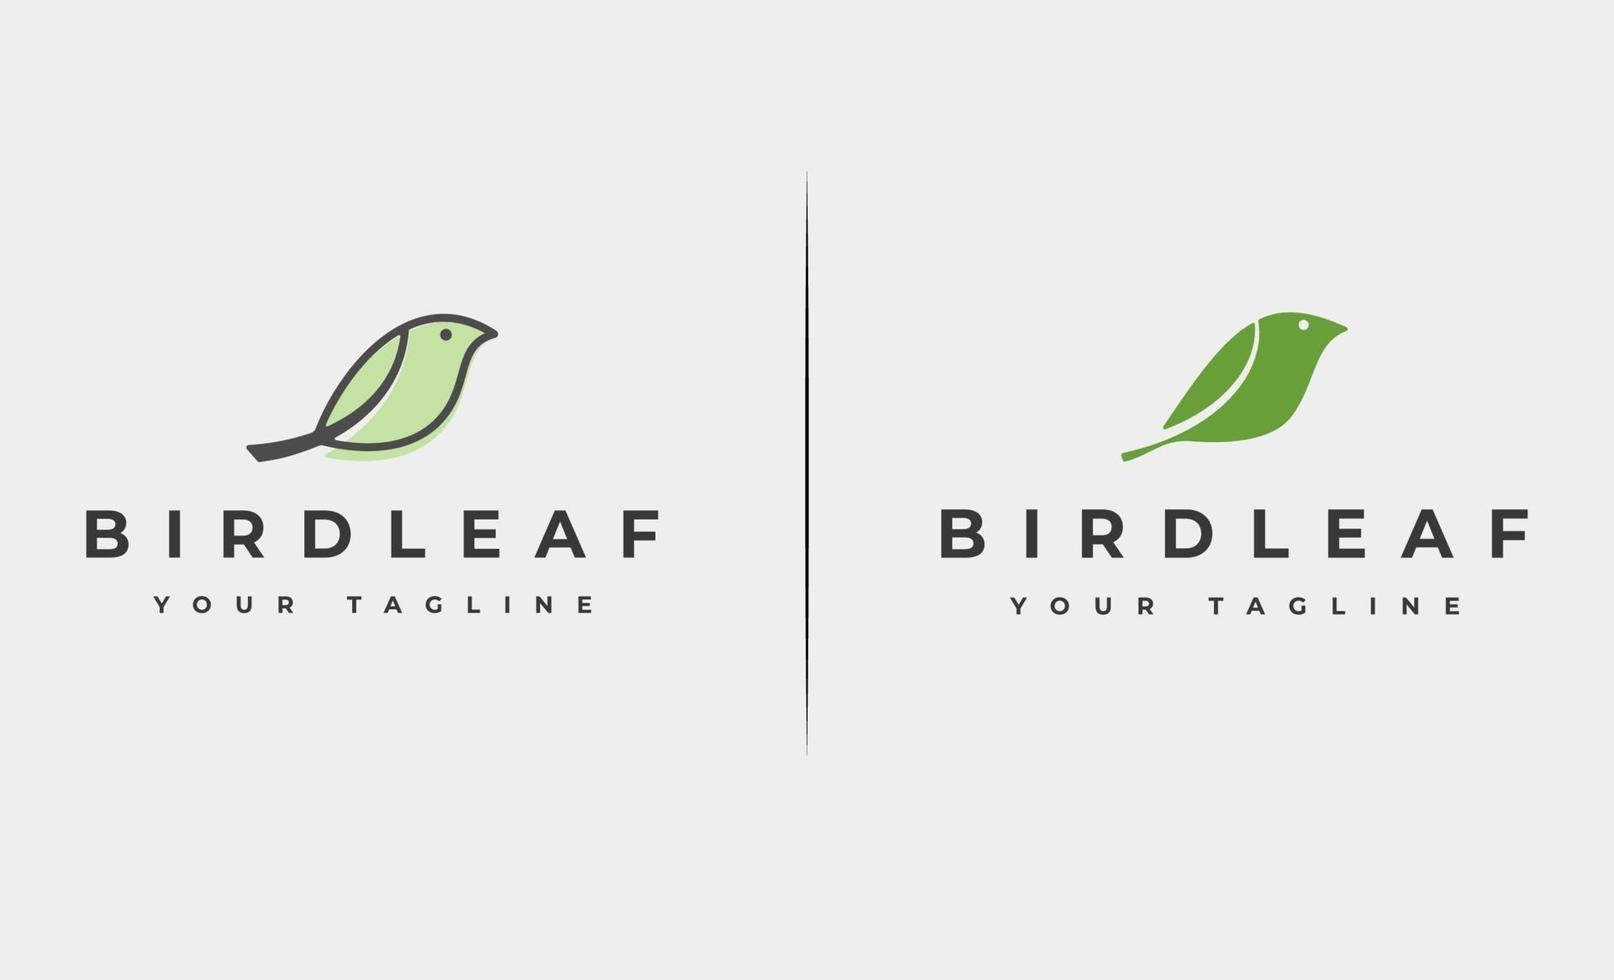 fågelblad logo design vektorillustration vektor